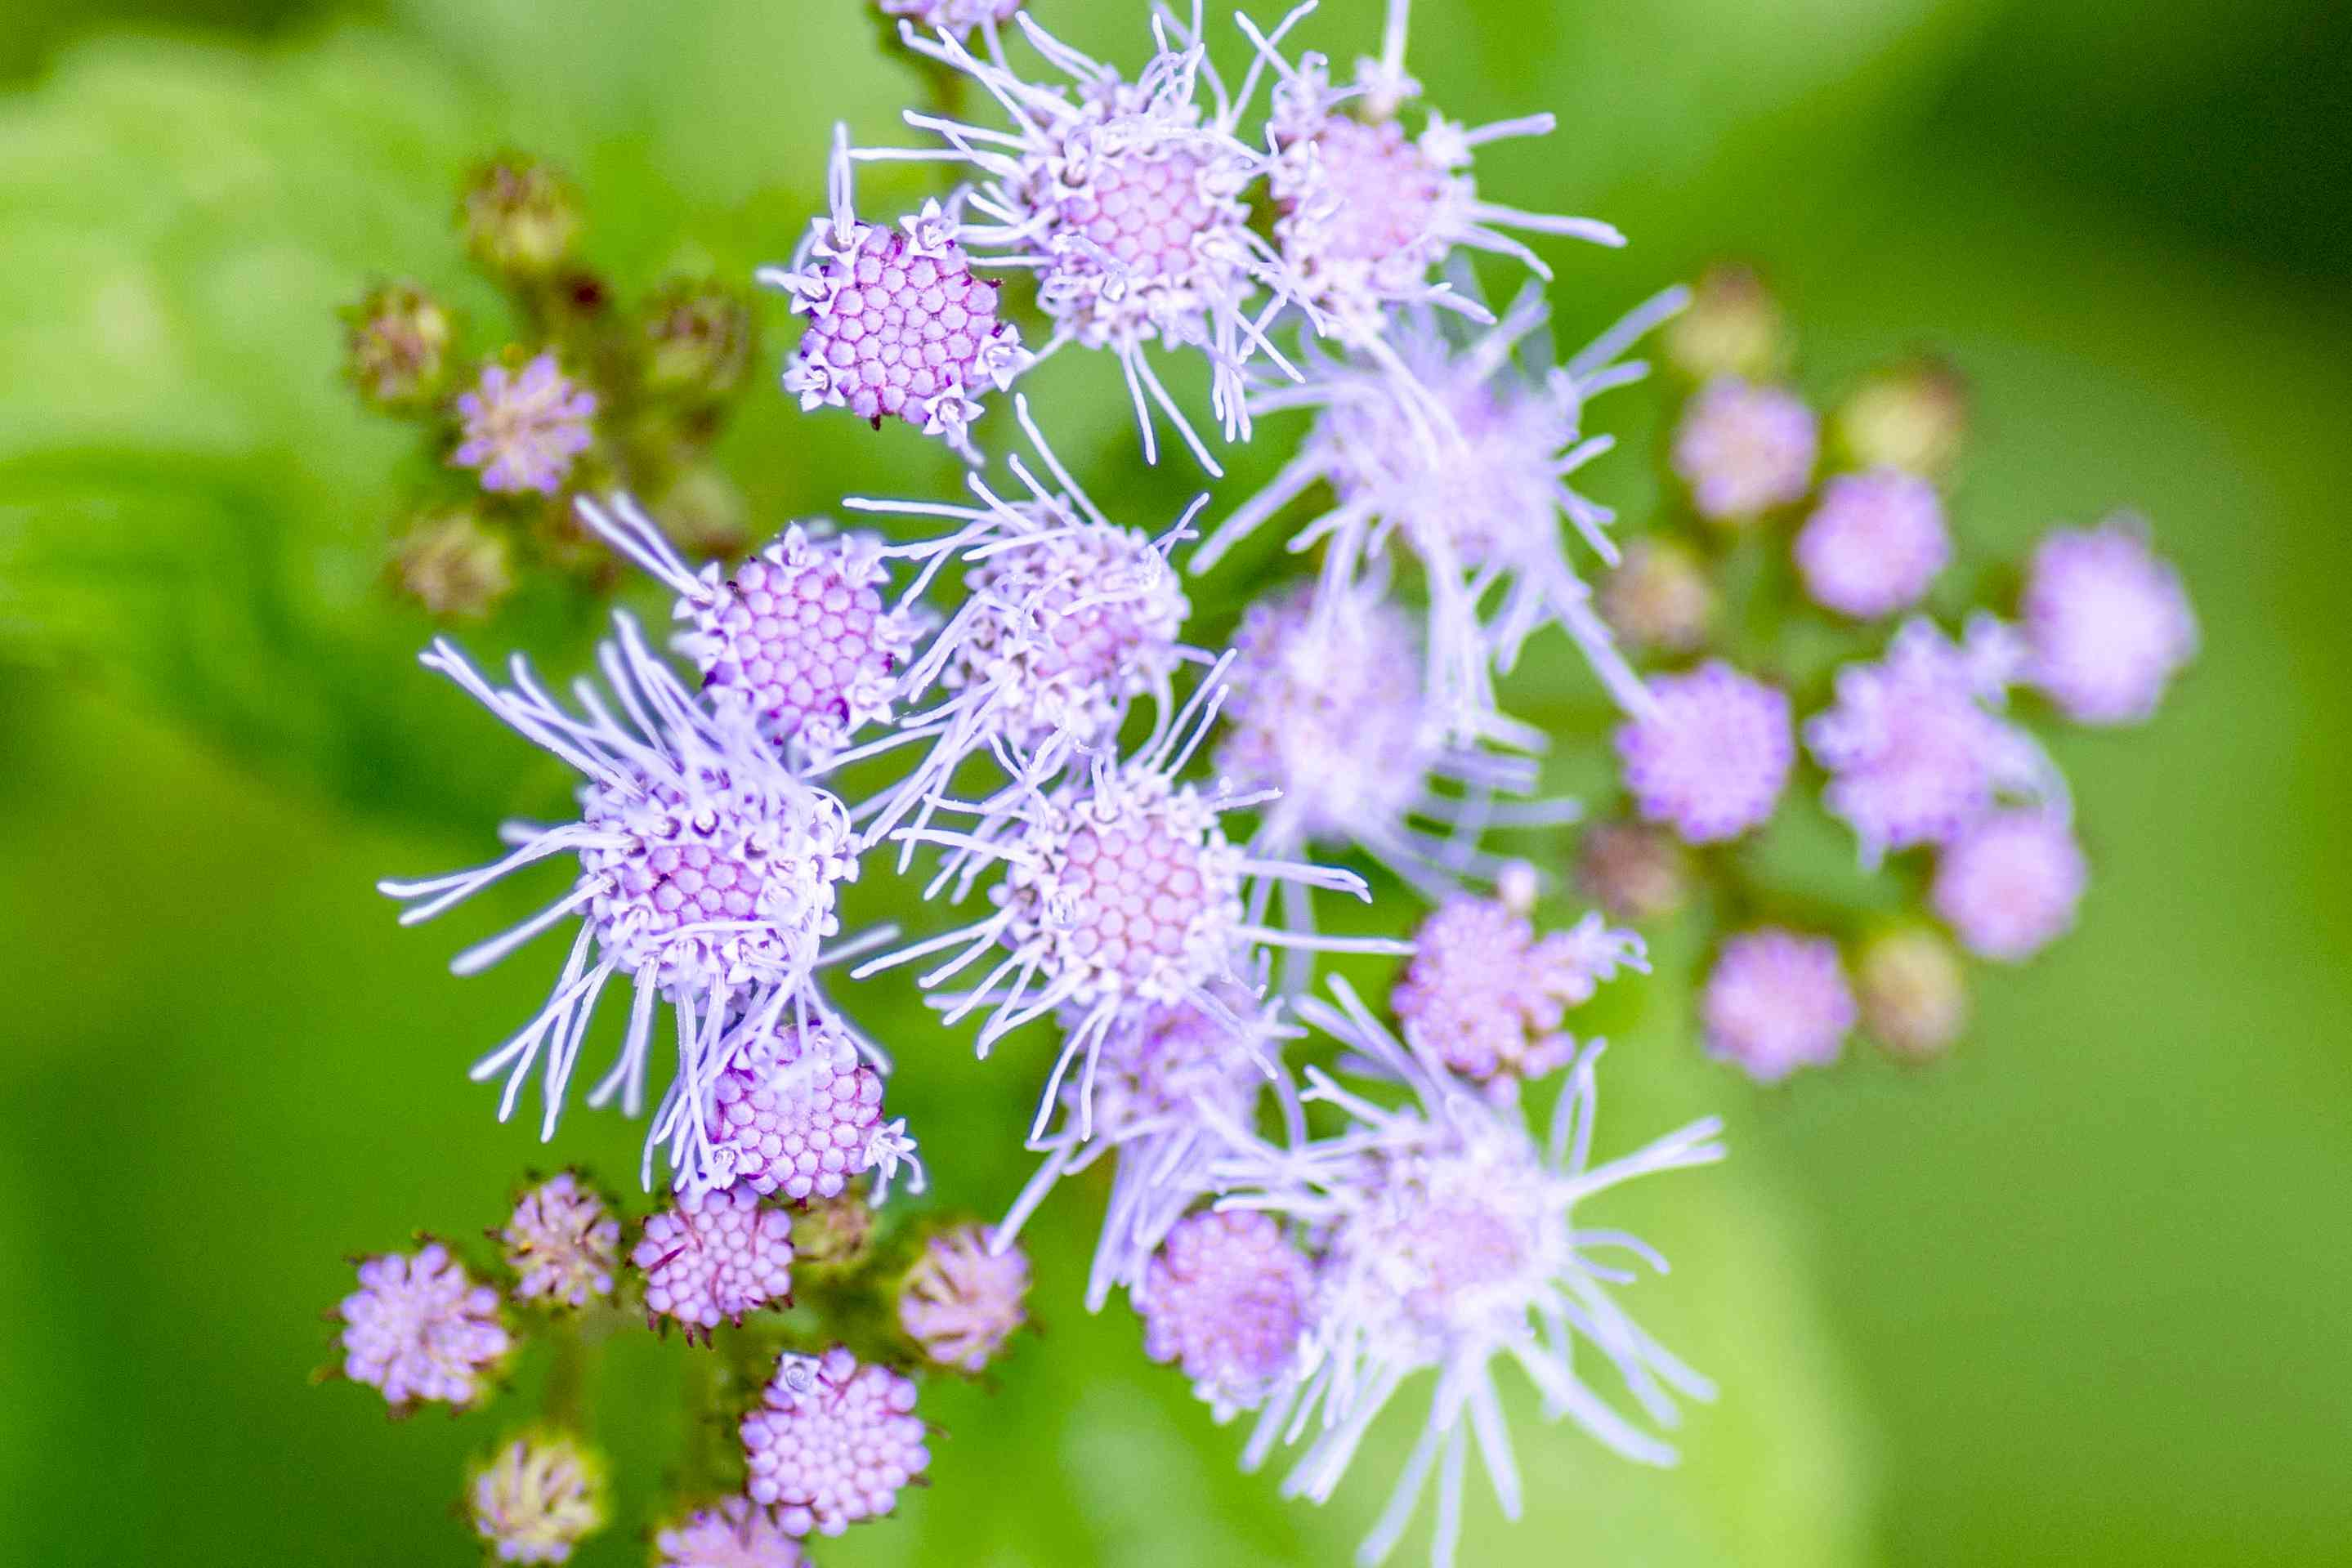 Blue mistflower with purple fuzzy flowers with long stamens closeup